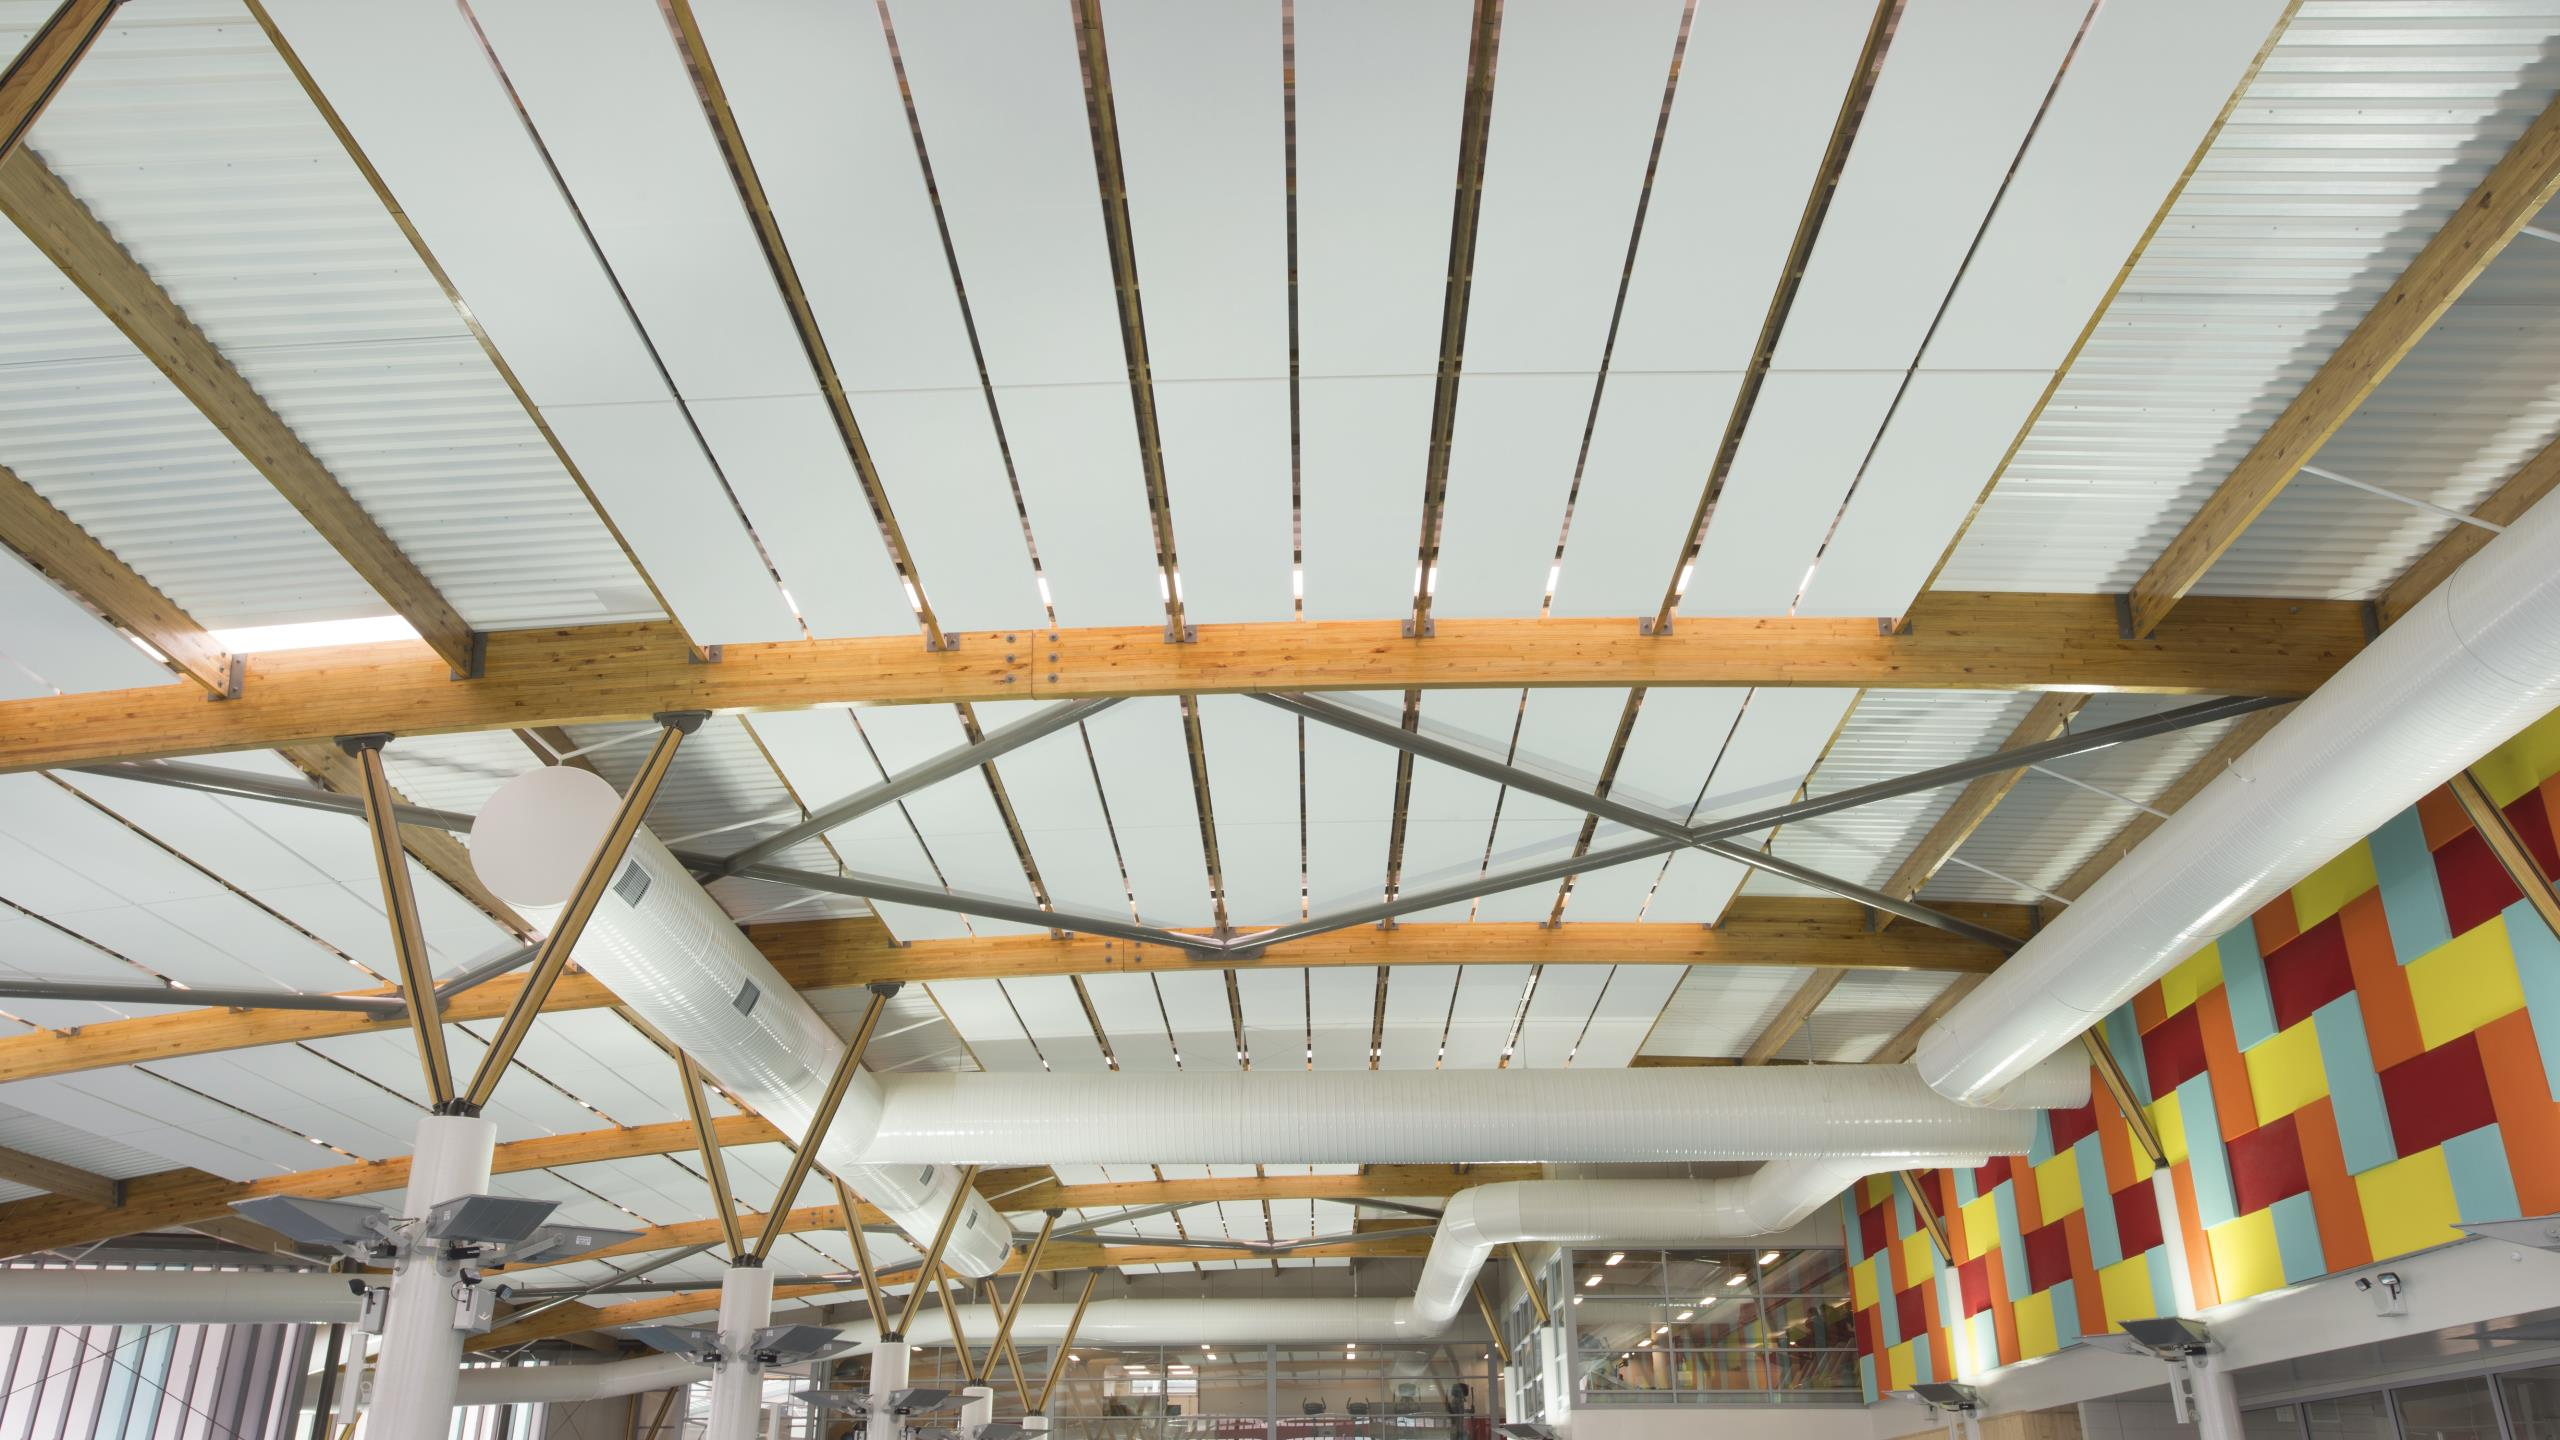 Otahuhu Recreational Precinct - Triton Pool ceiling panels